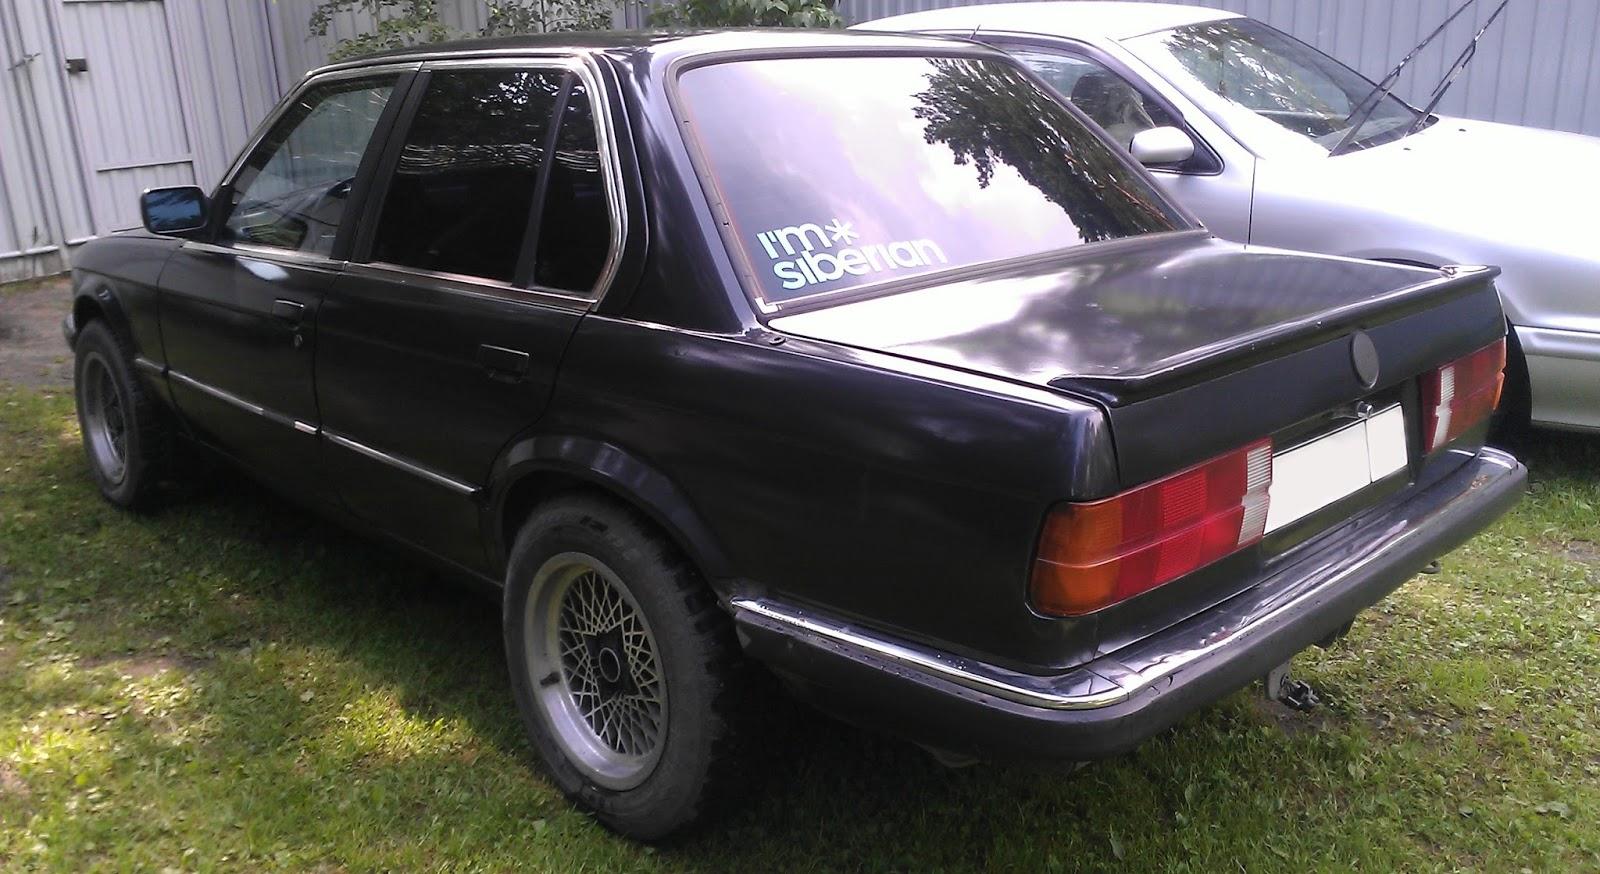 марка автомобиля со знаком барана